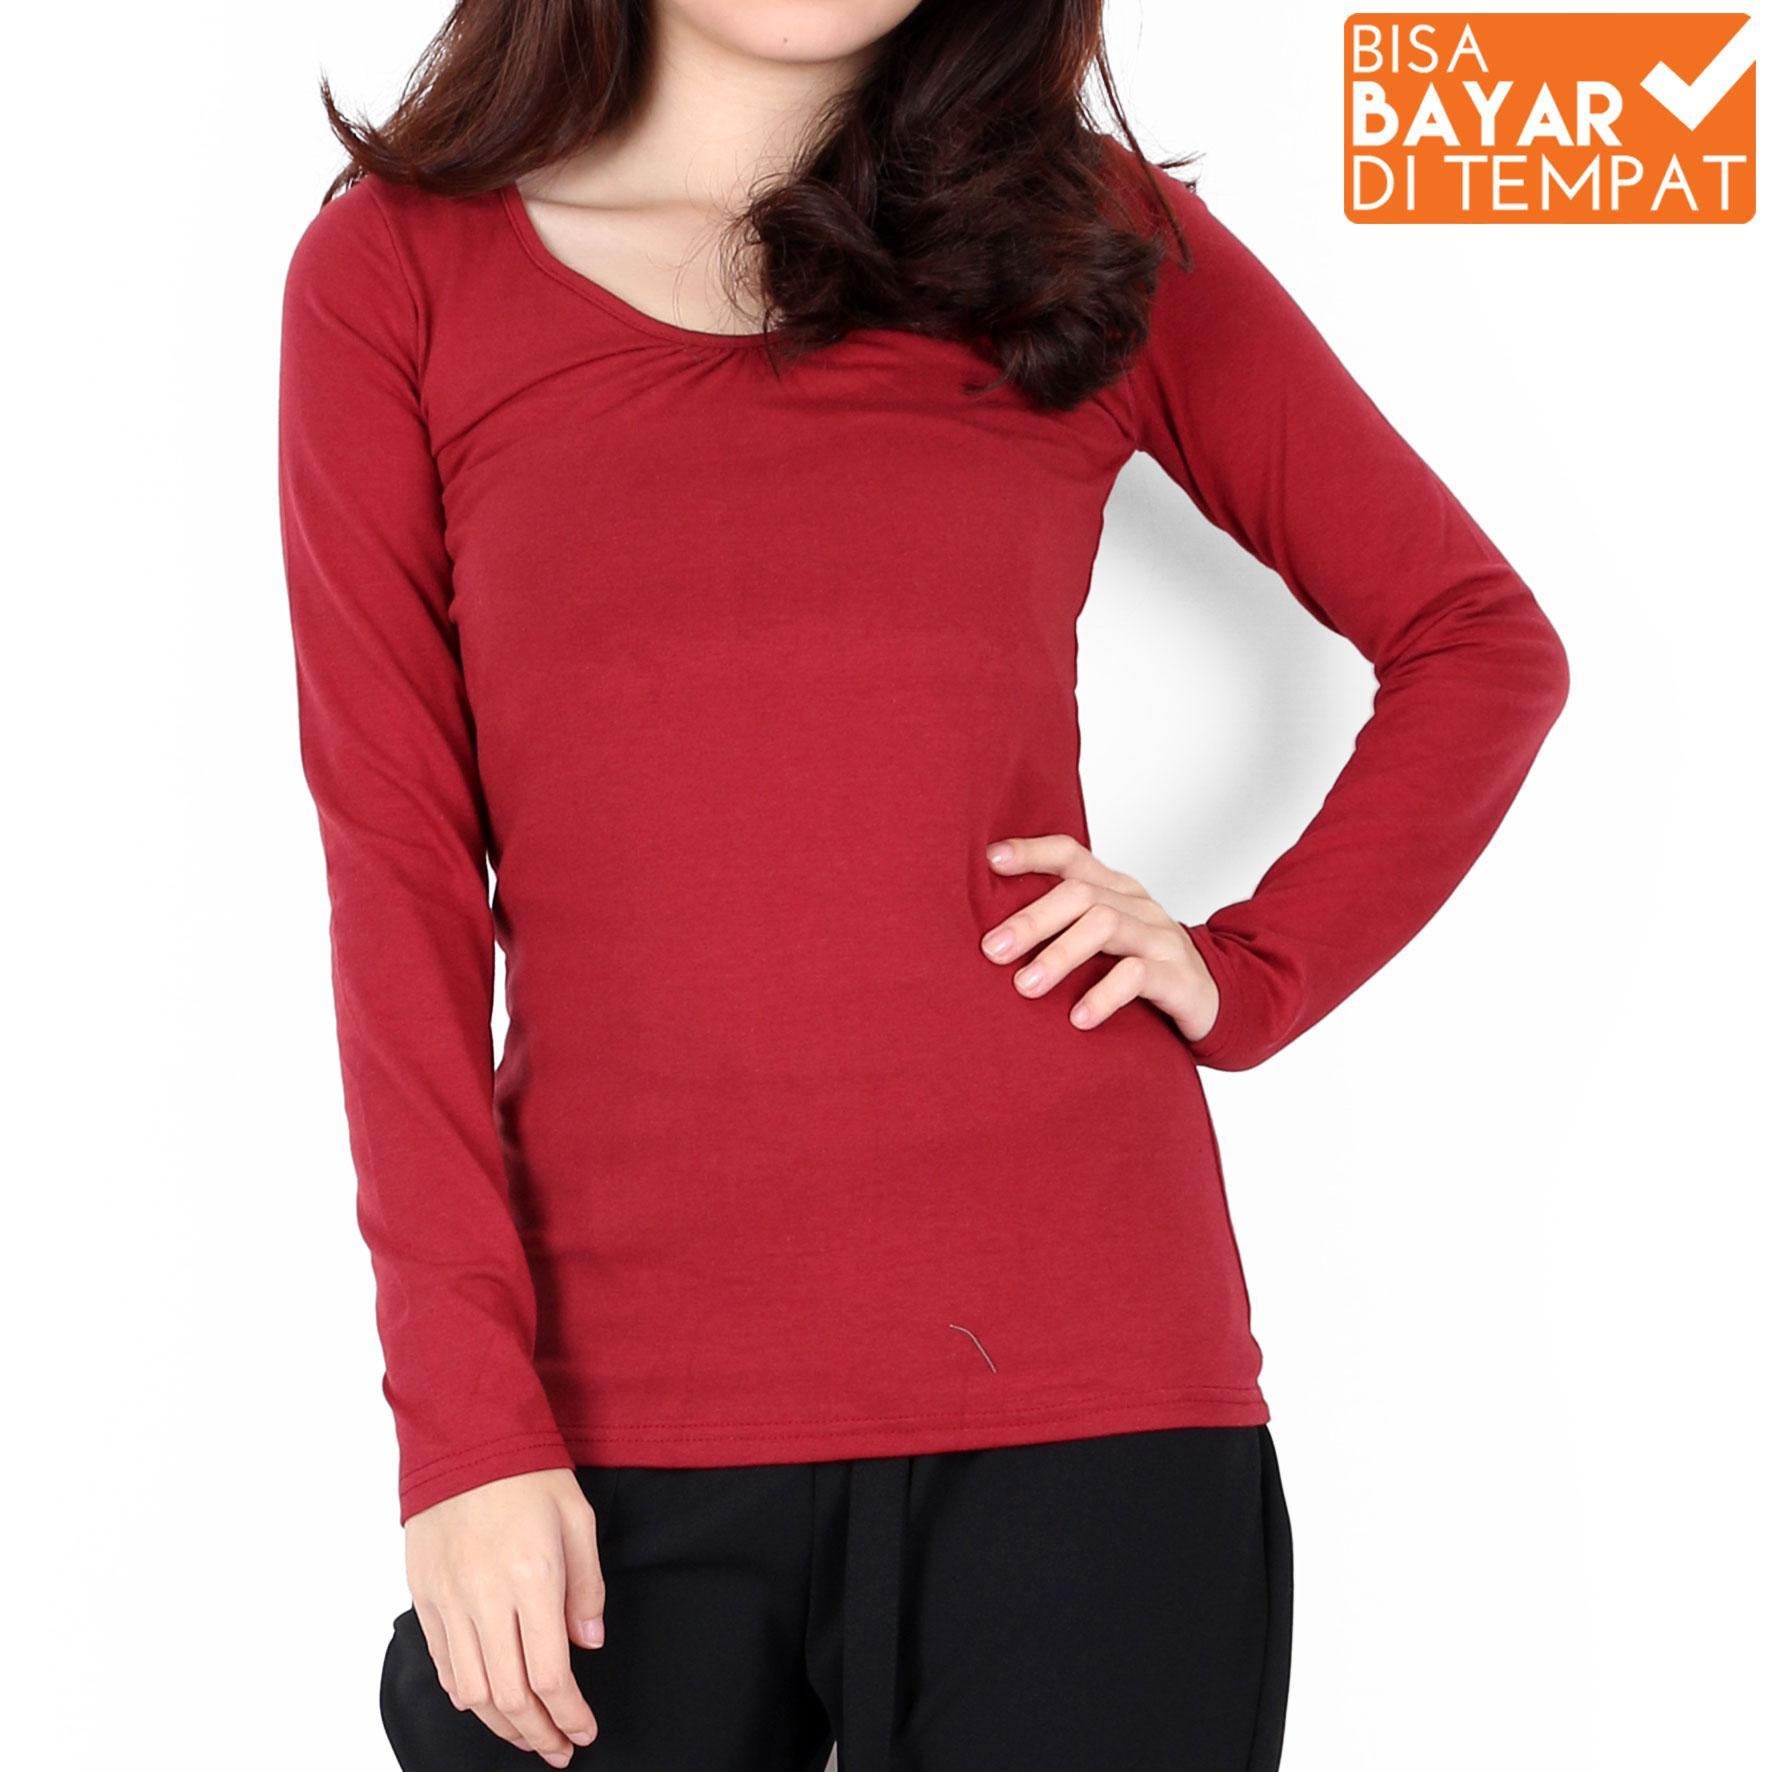 All Item 35K blouse casual blouse kerja blouse wanita baju kerja baju korea-Merah